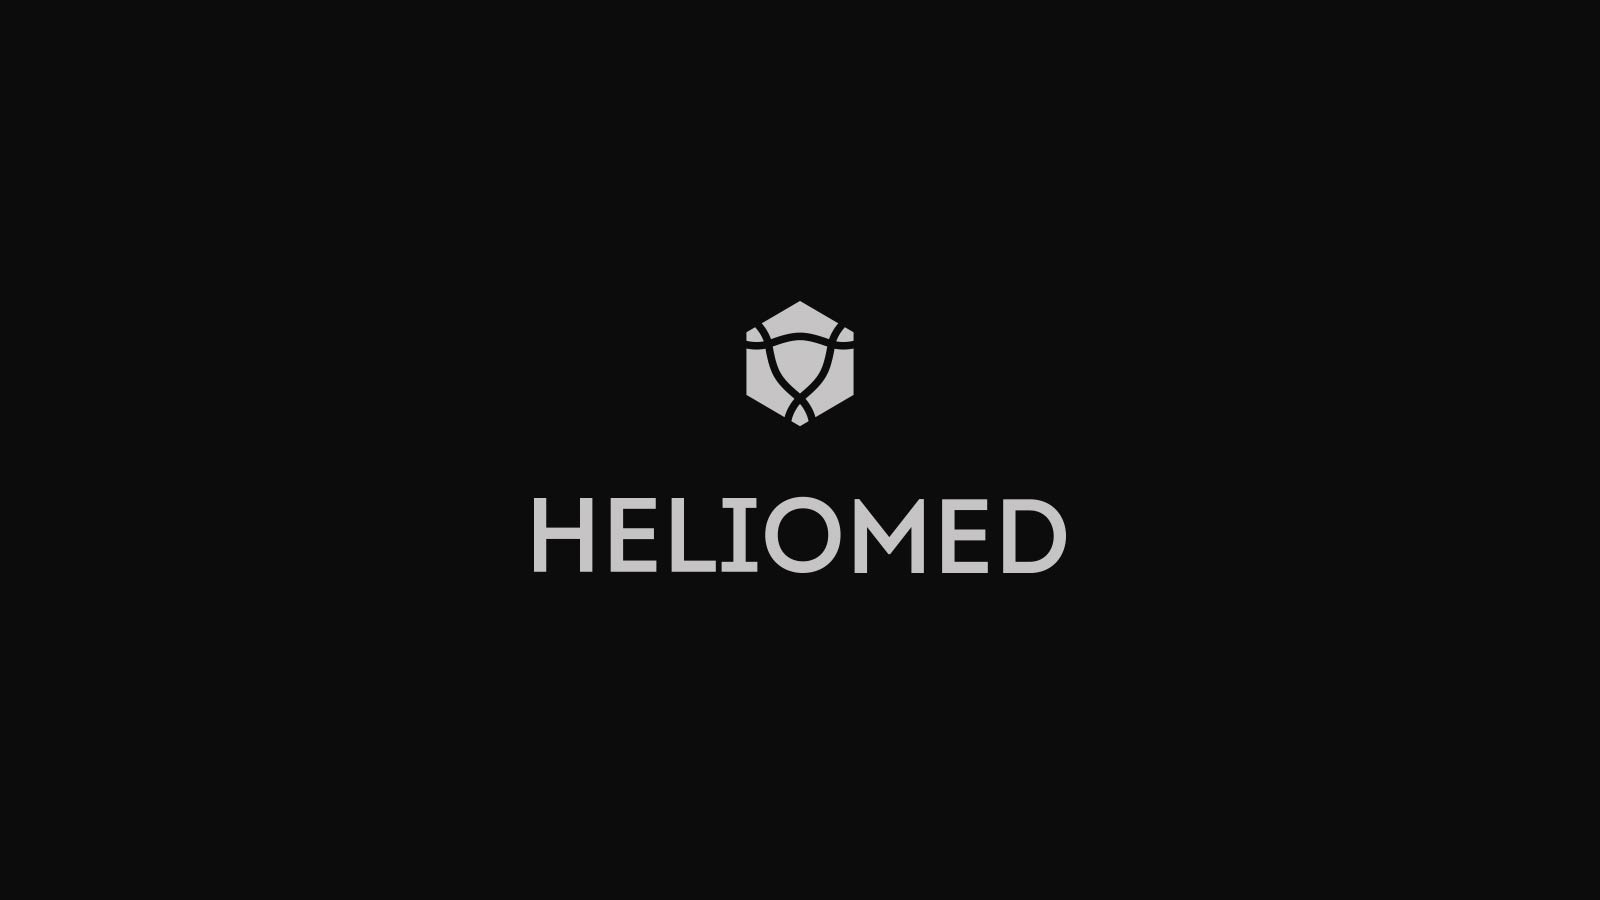 Heliomed